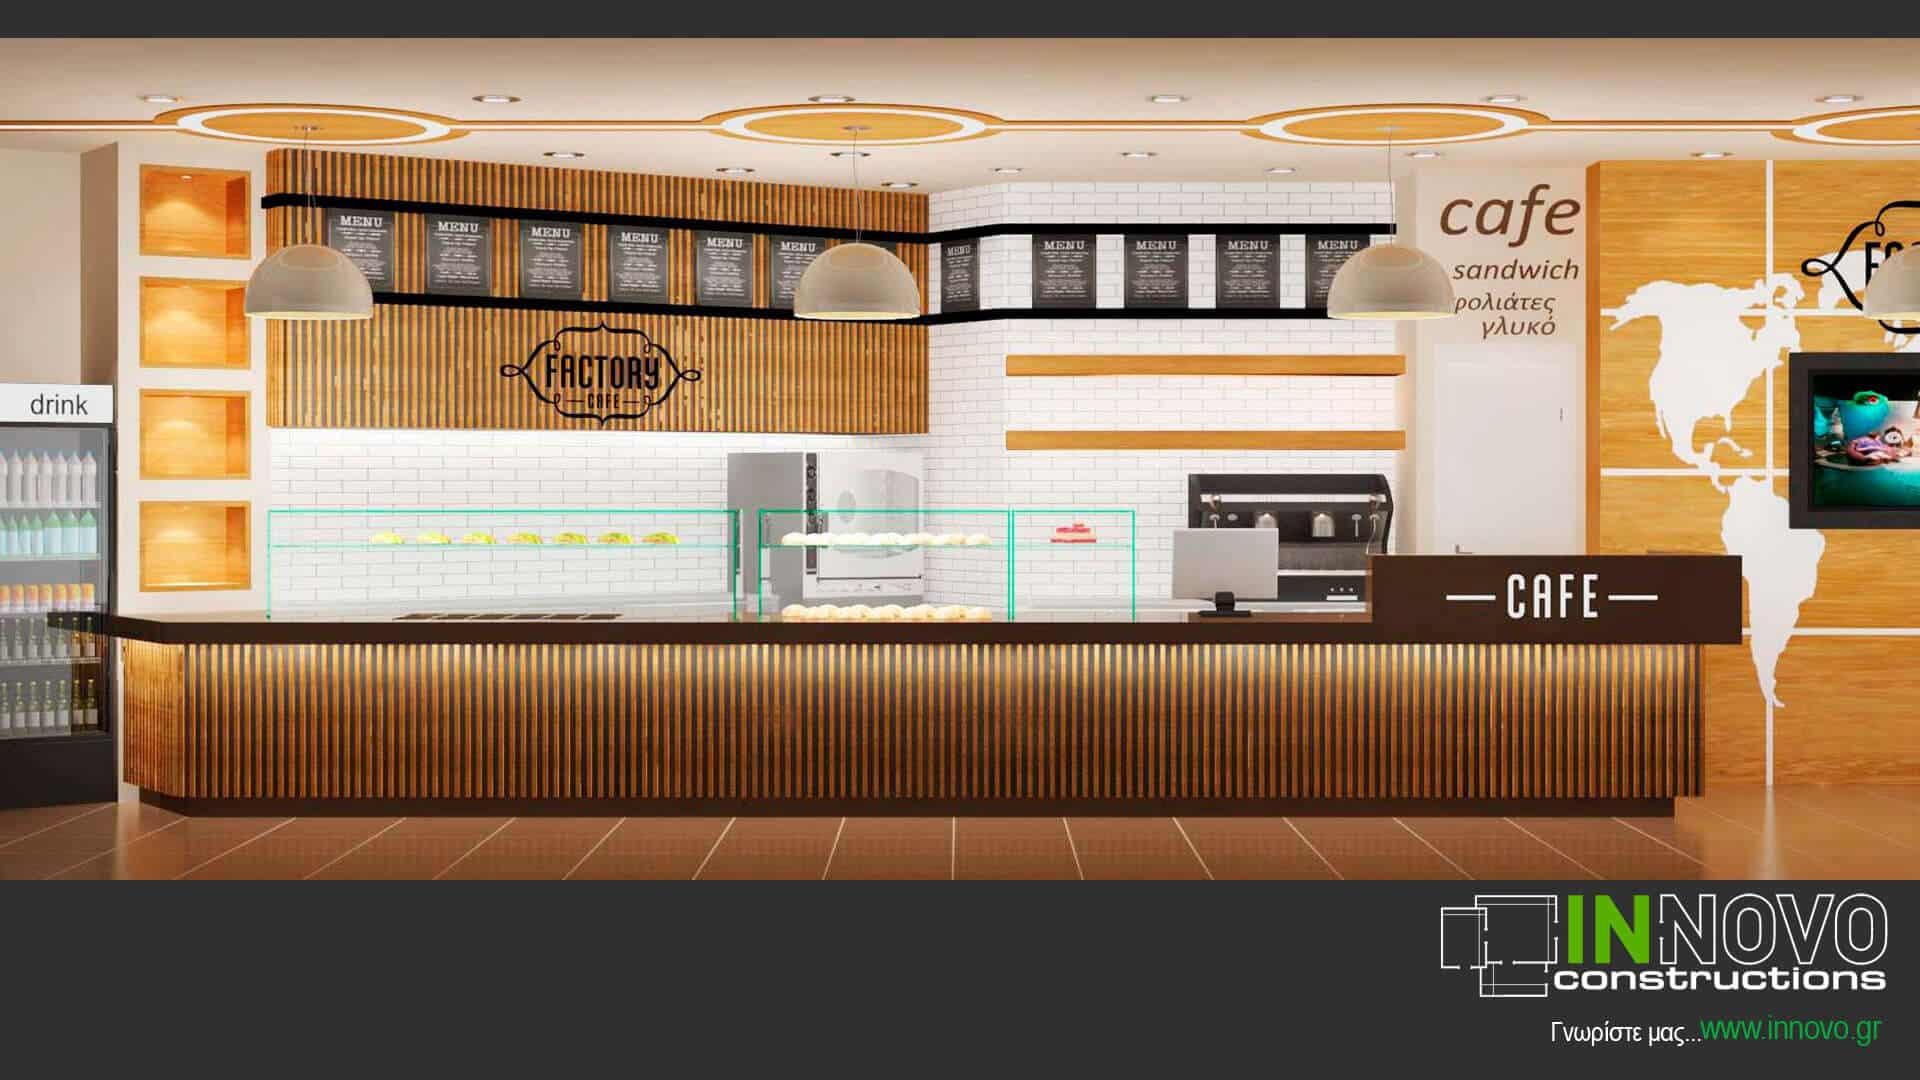 kataskevi-snack-cafe-construction-snack-gerakas-1842